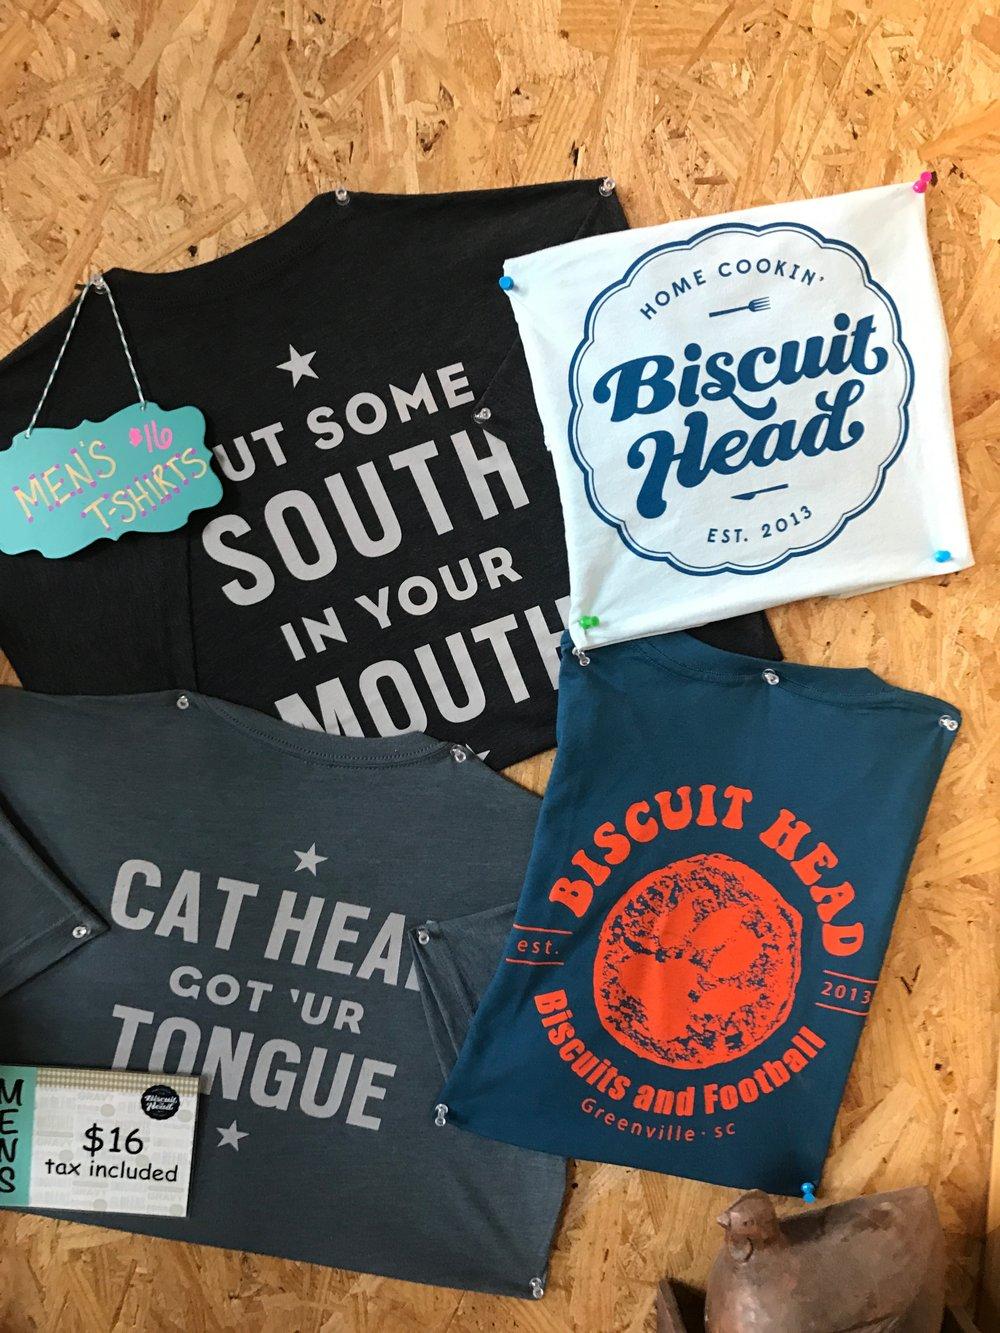 Biscuit Head Shirt in Store.JPG